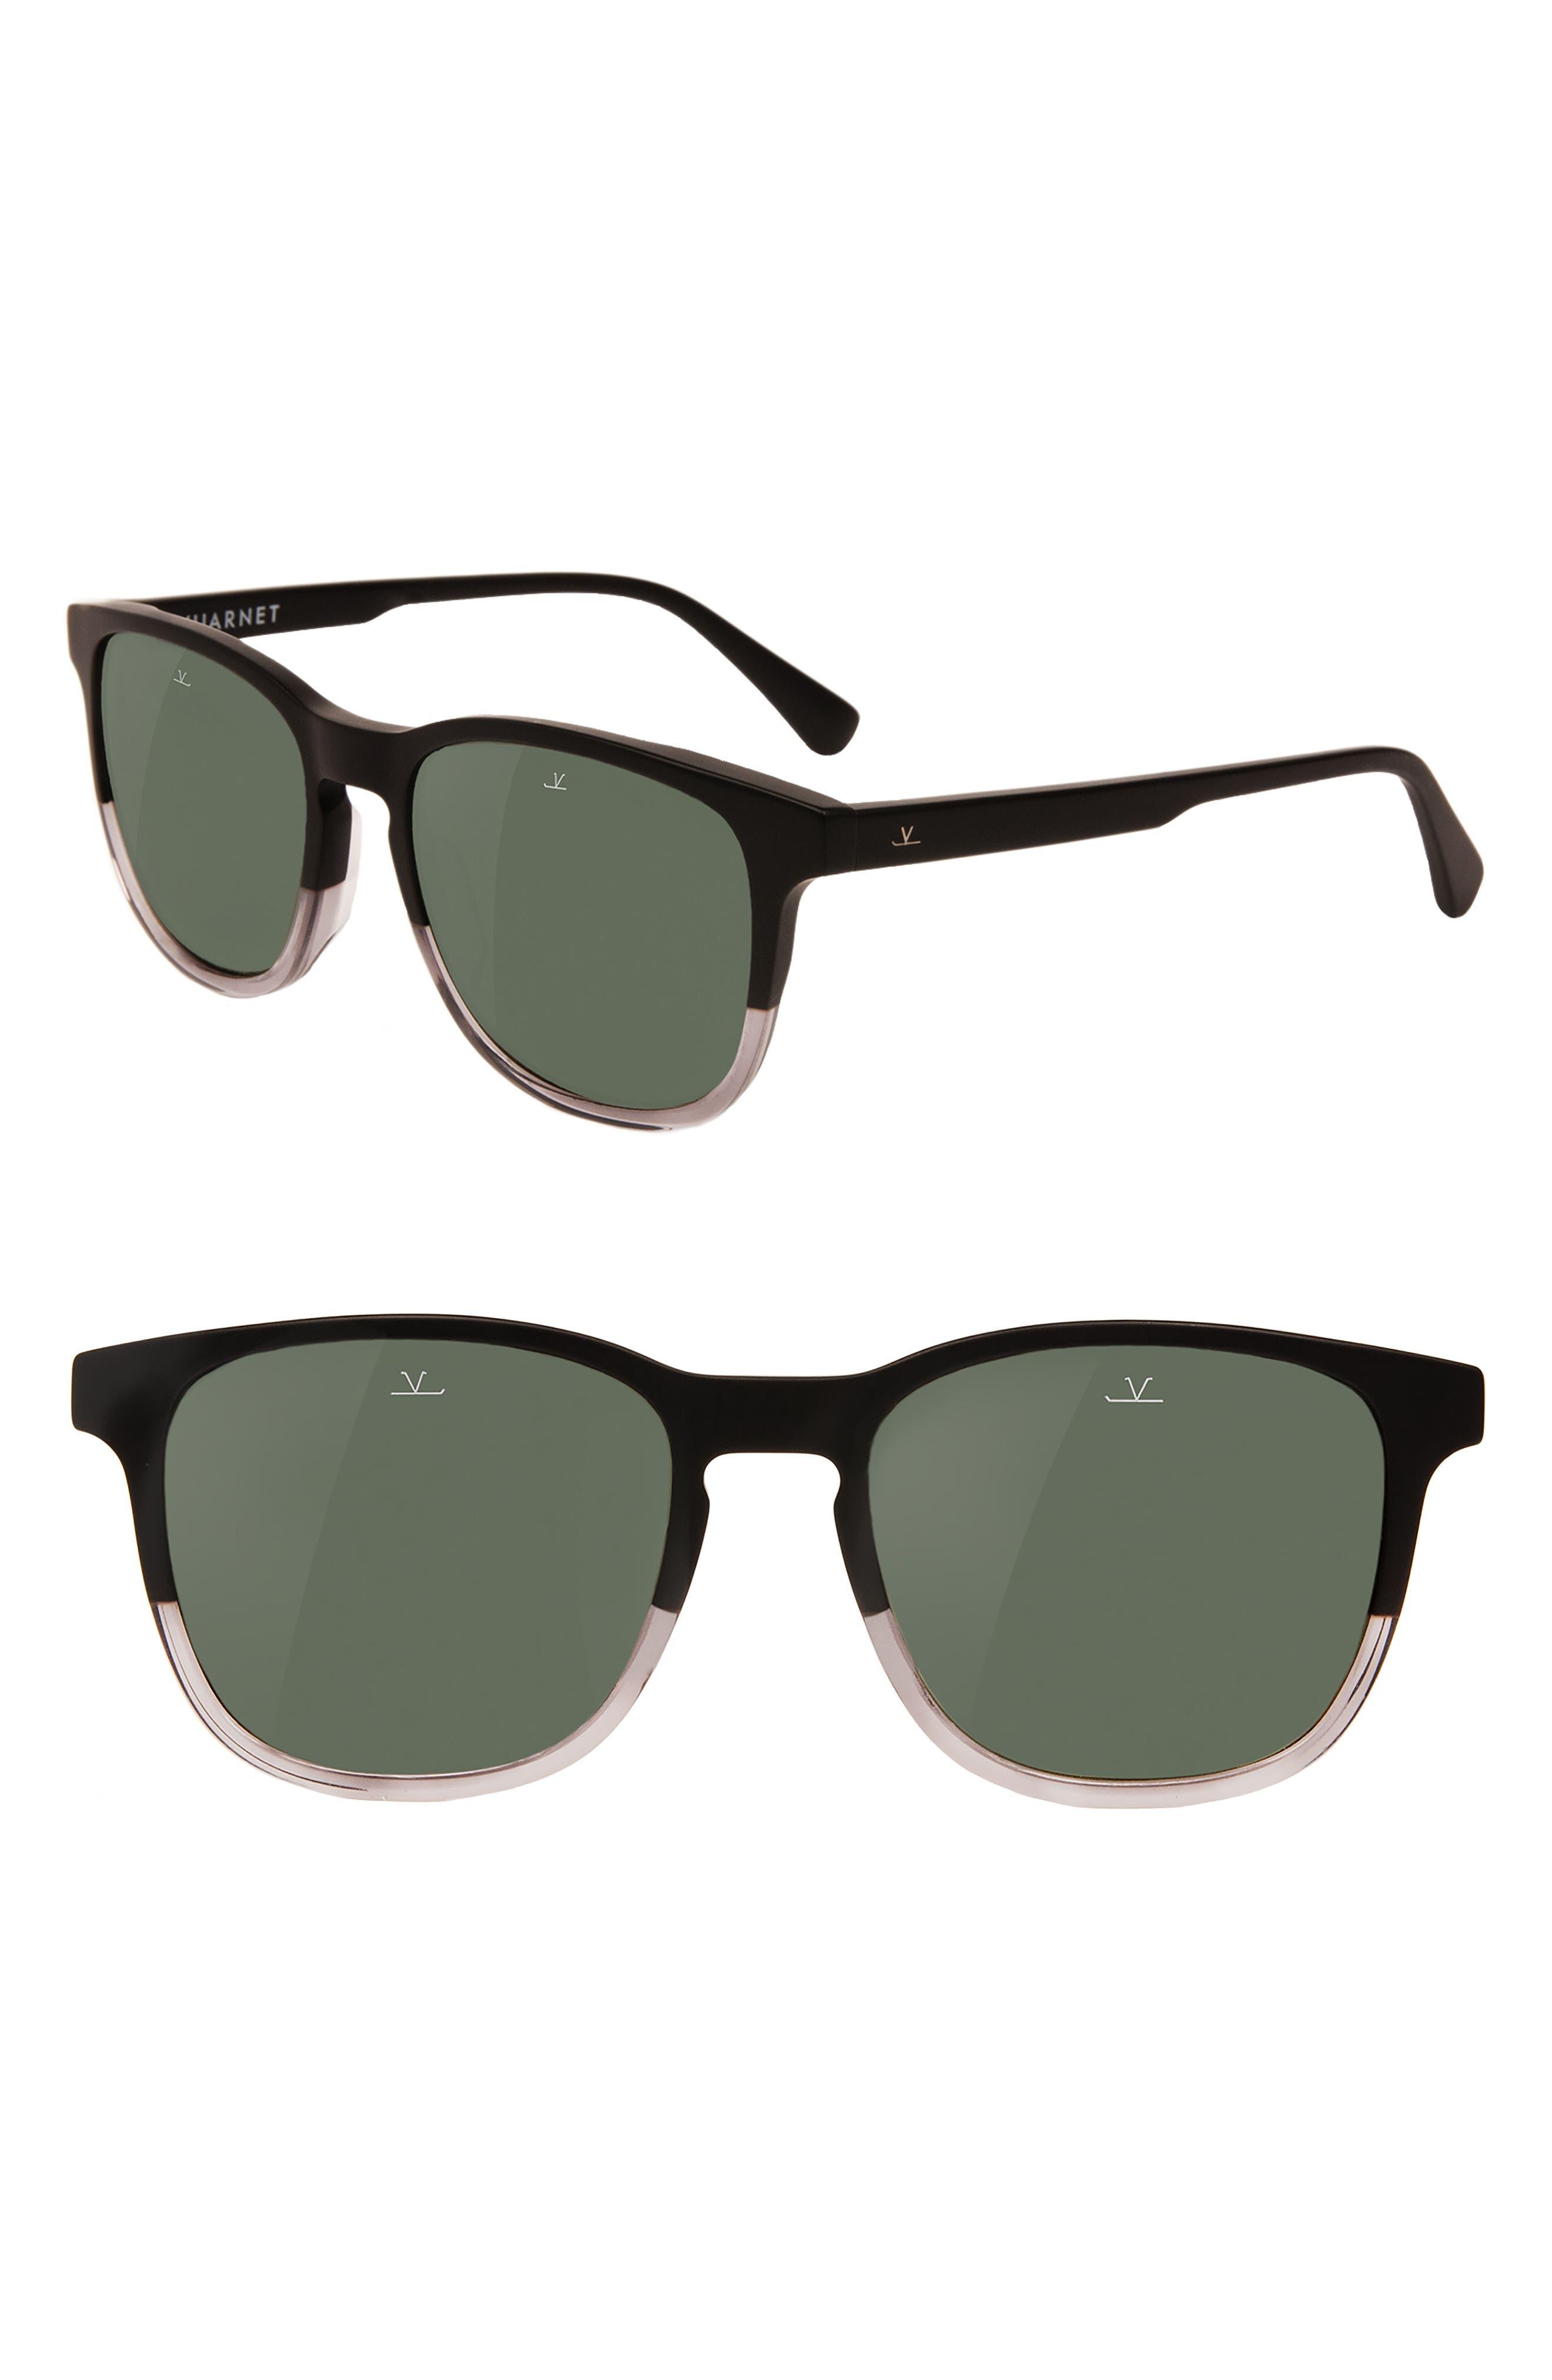 District Medium 53mm Polarized Sunglasses,                         Main,                         color, MATT BLACK/ GREY POLARIZED